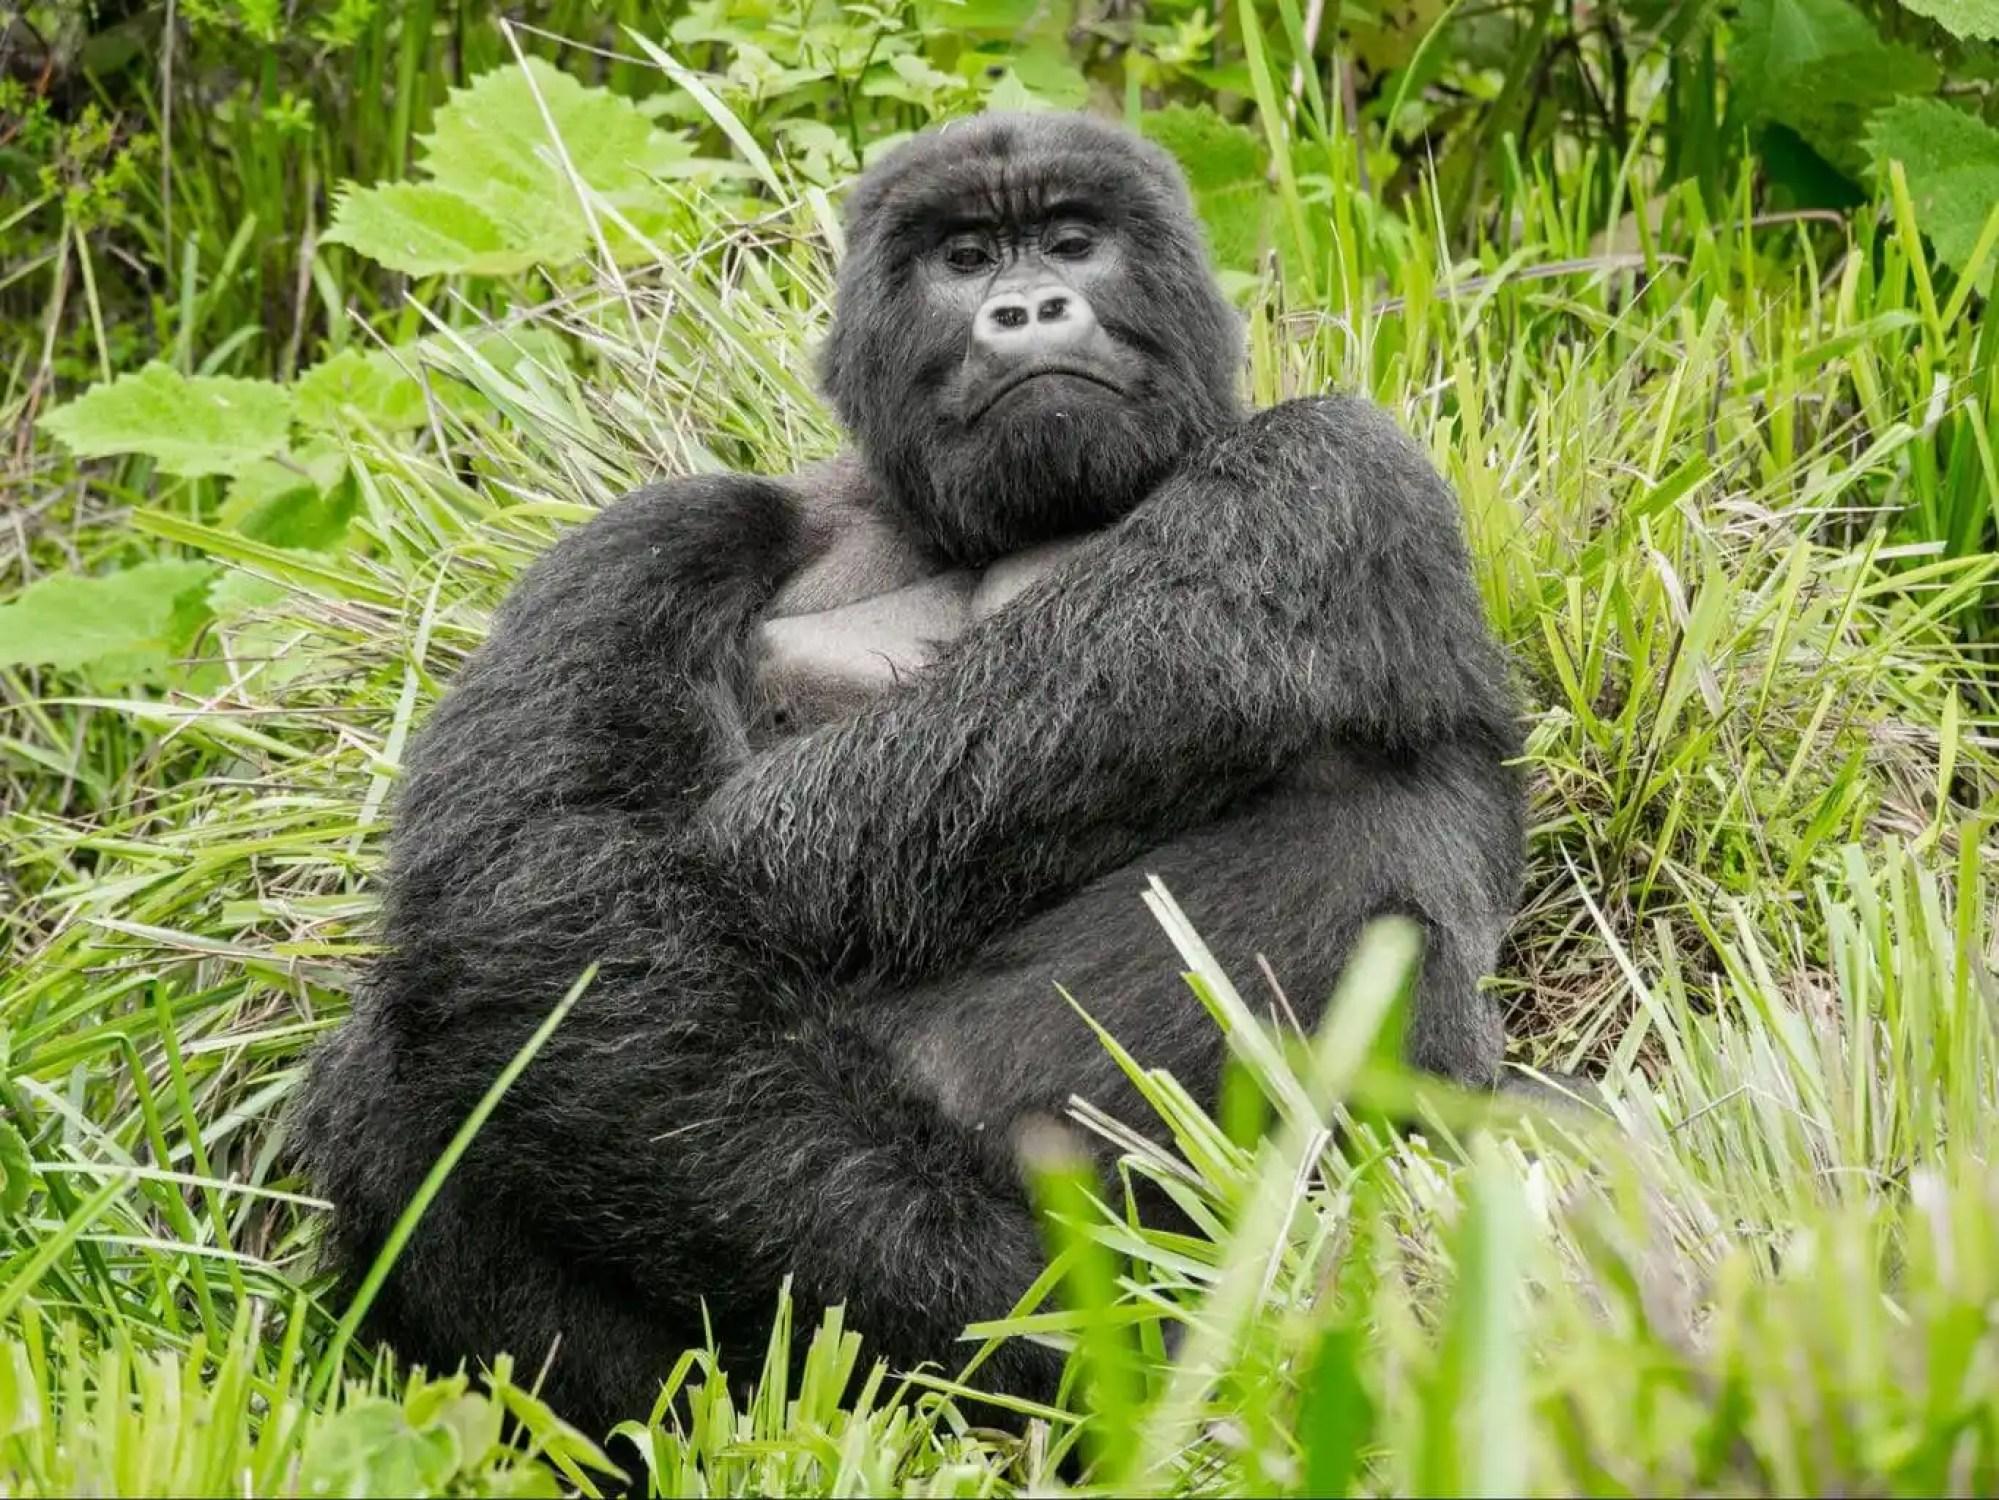 The silverback gorilla, imposing